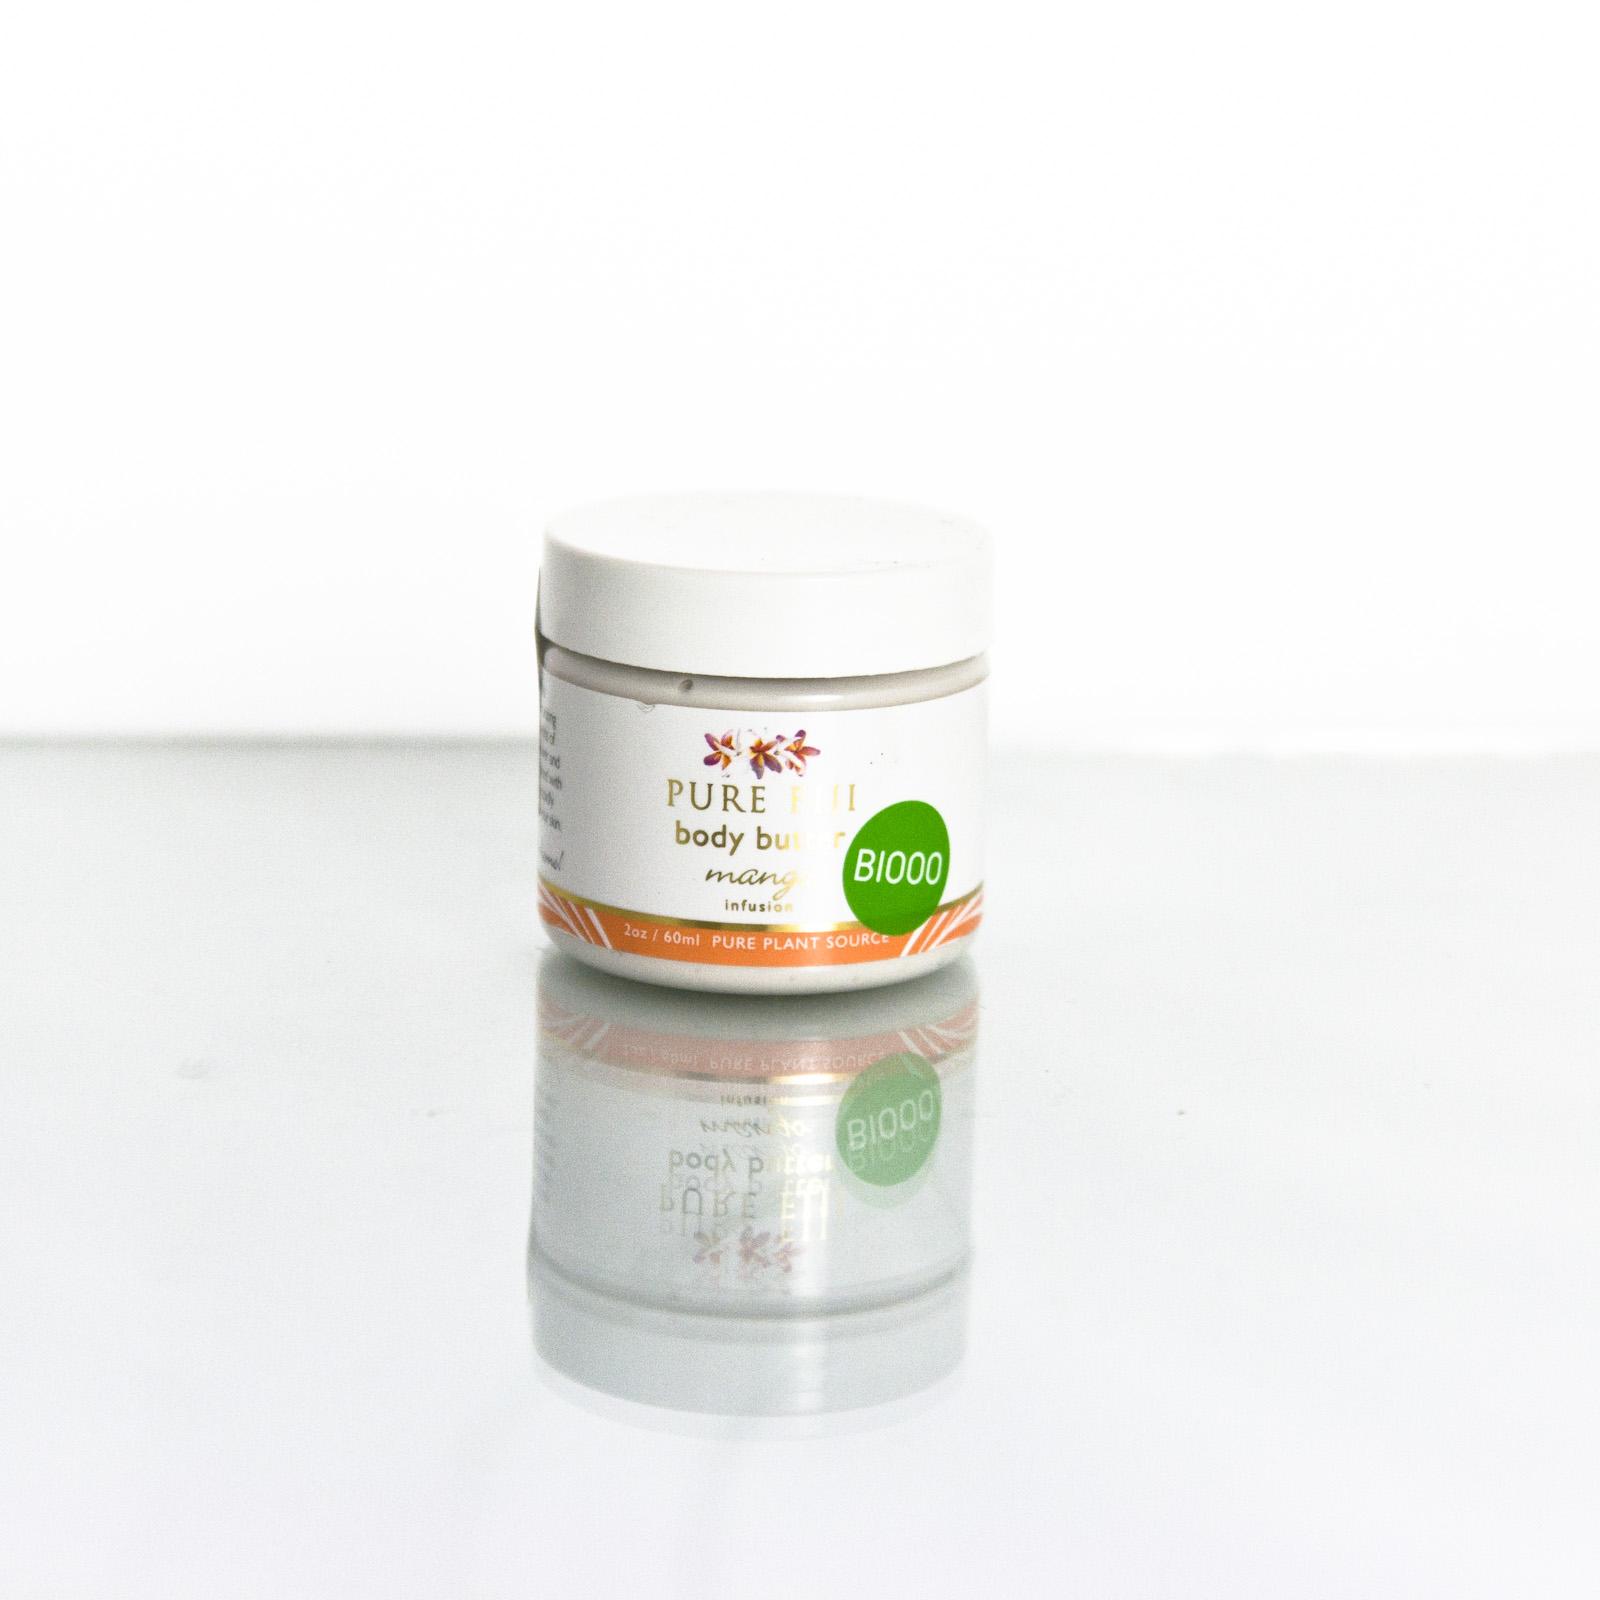 Pure Fiji Tělové máslo, mango 60 ml